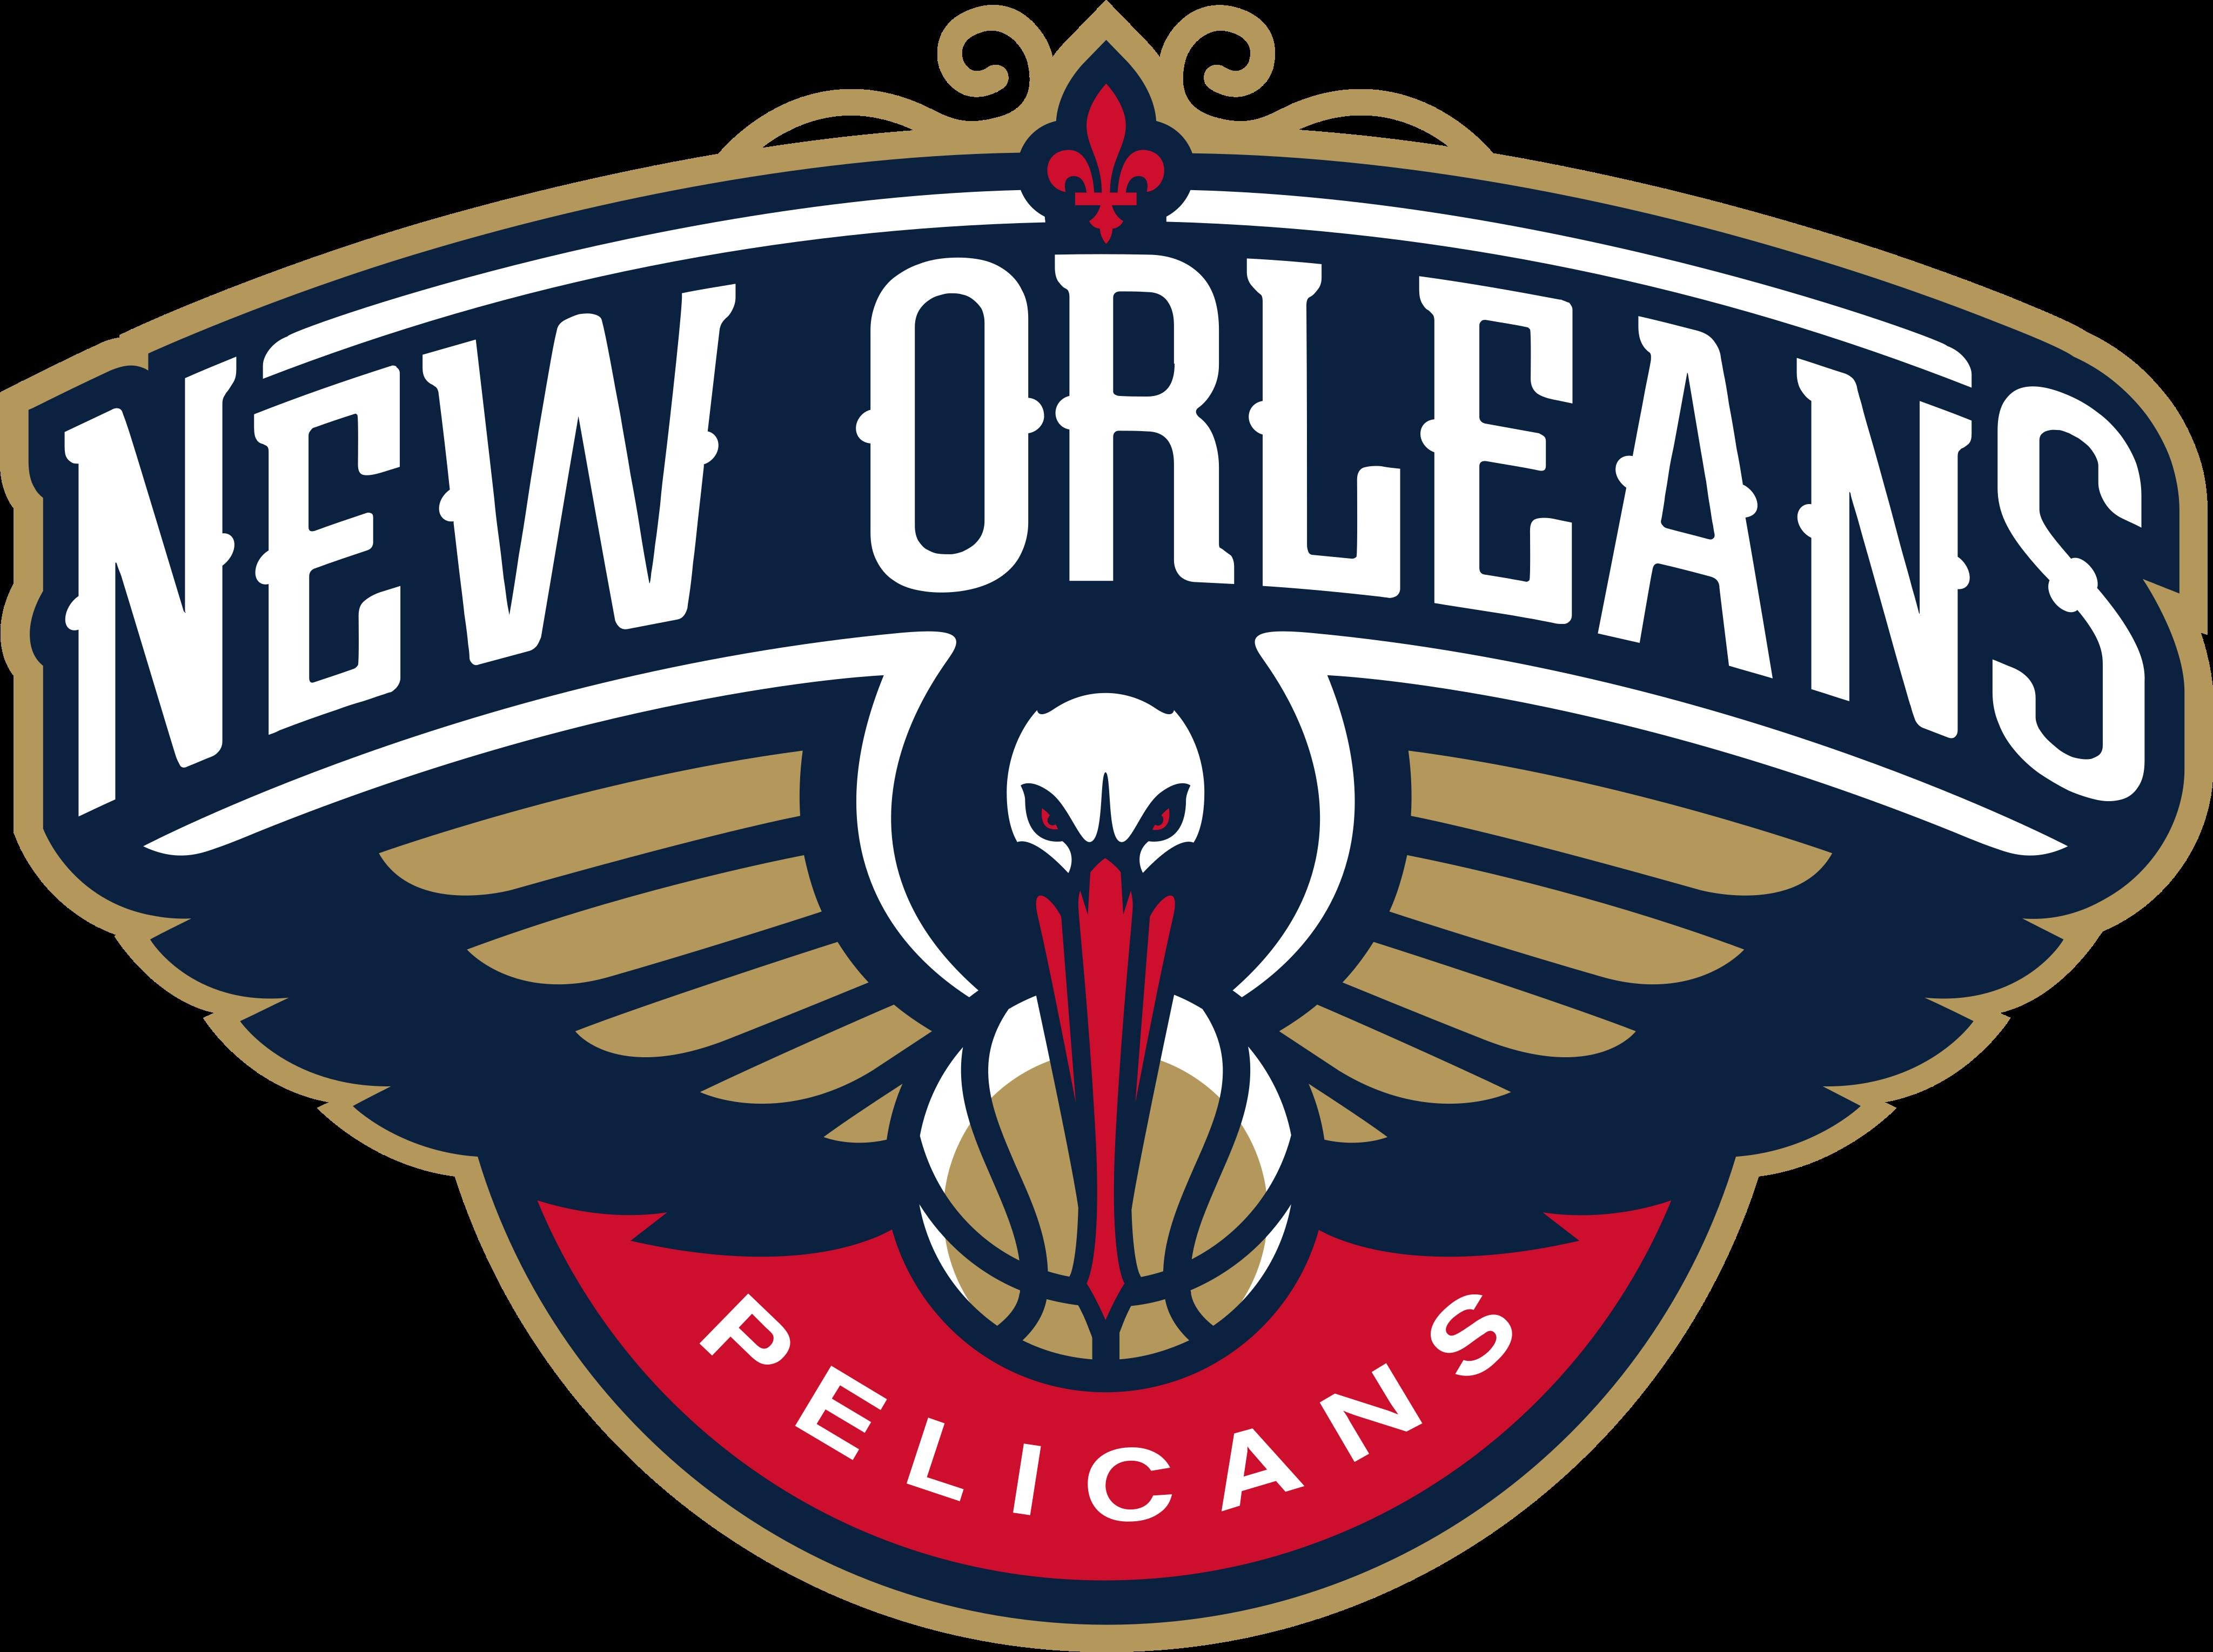 New Orleans Pelicans Logo.